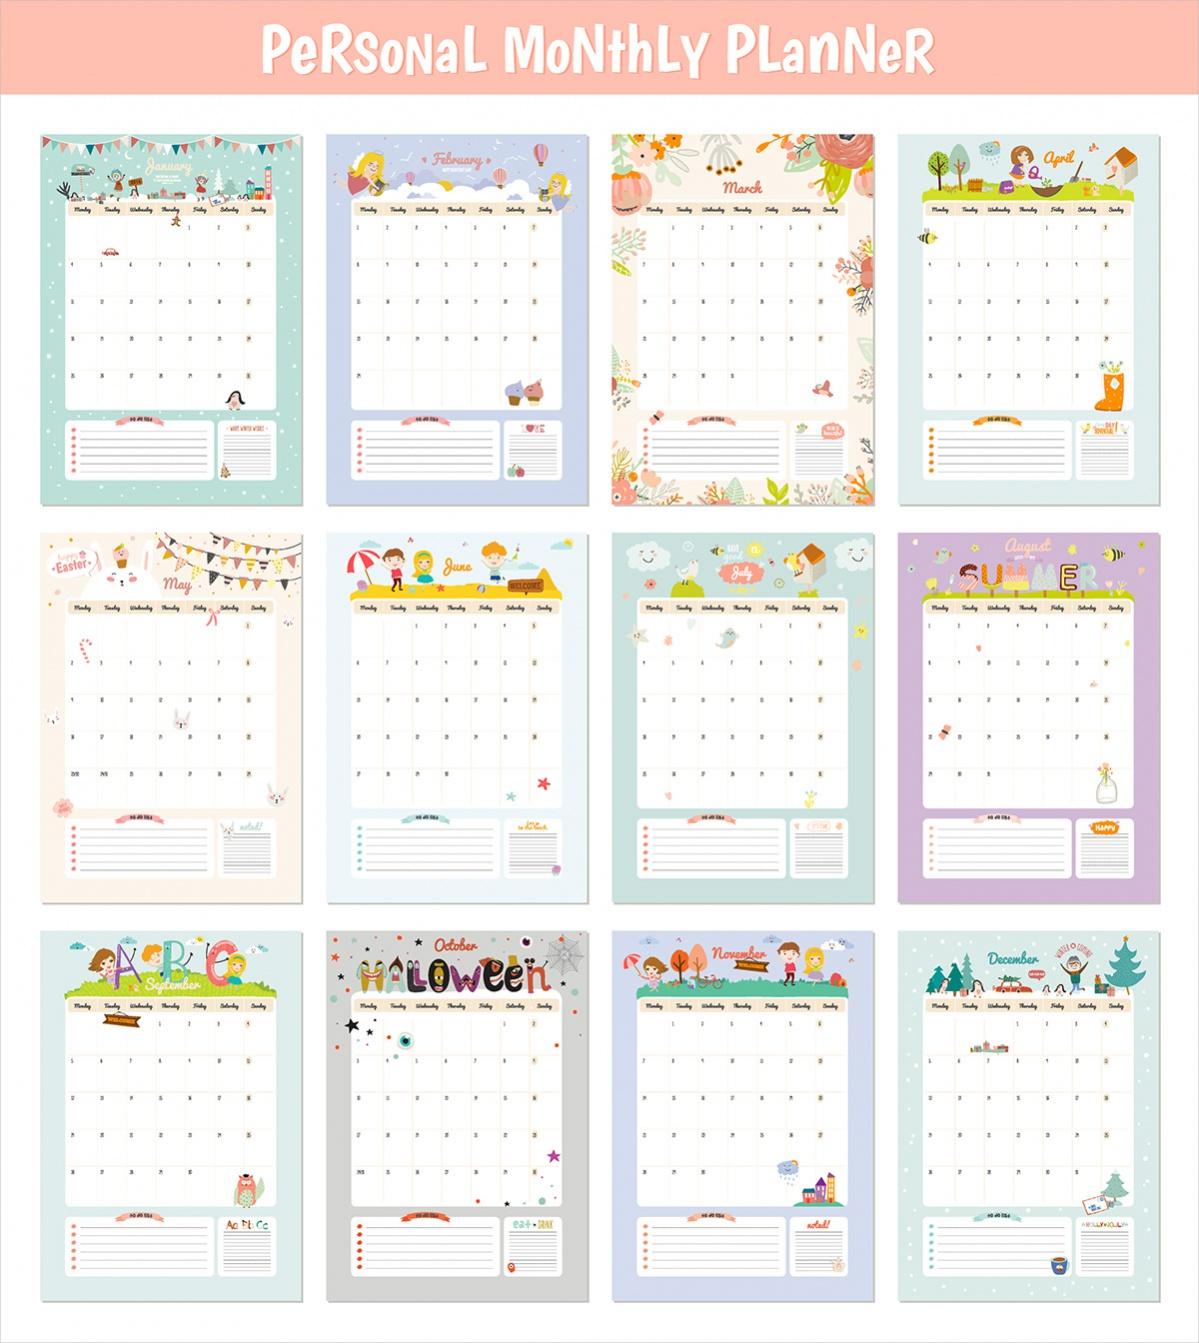 Daily Schedule Planner Calendar